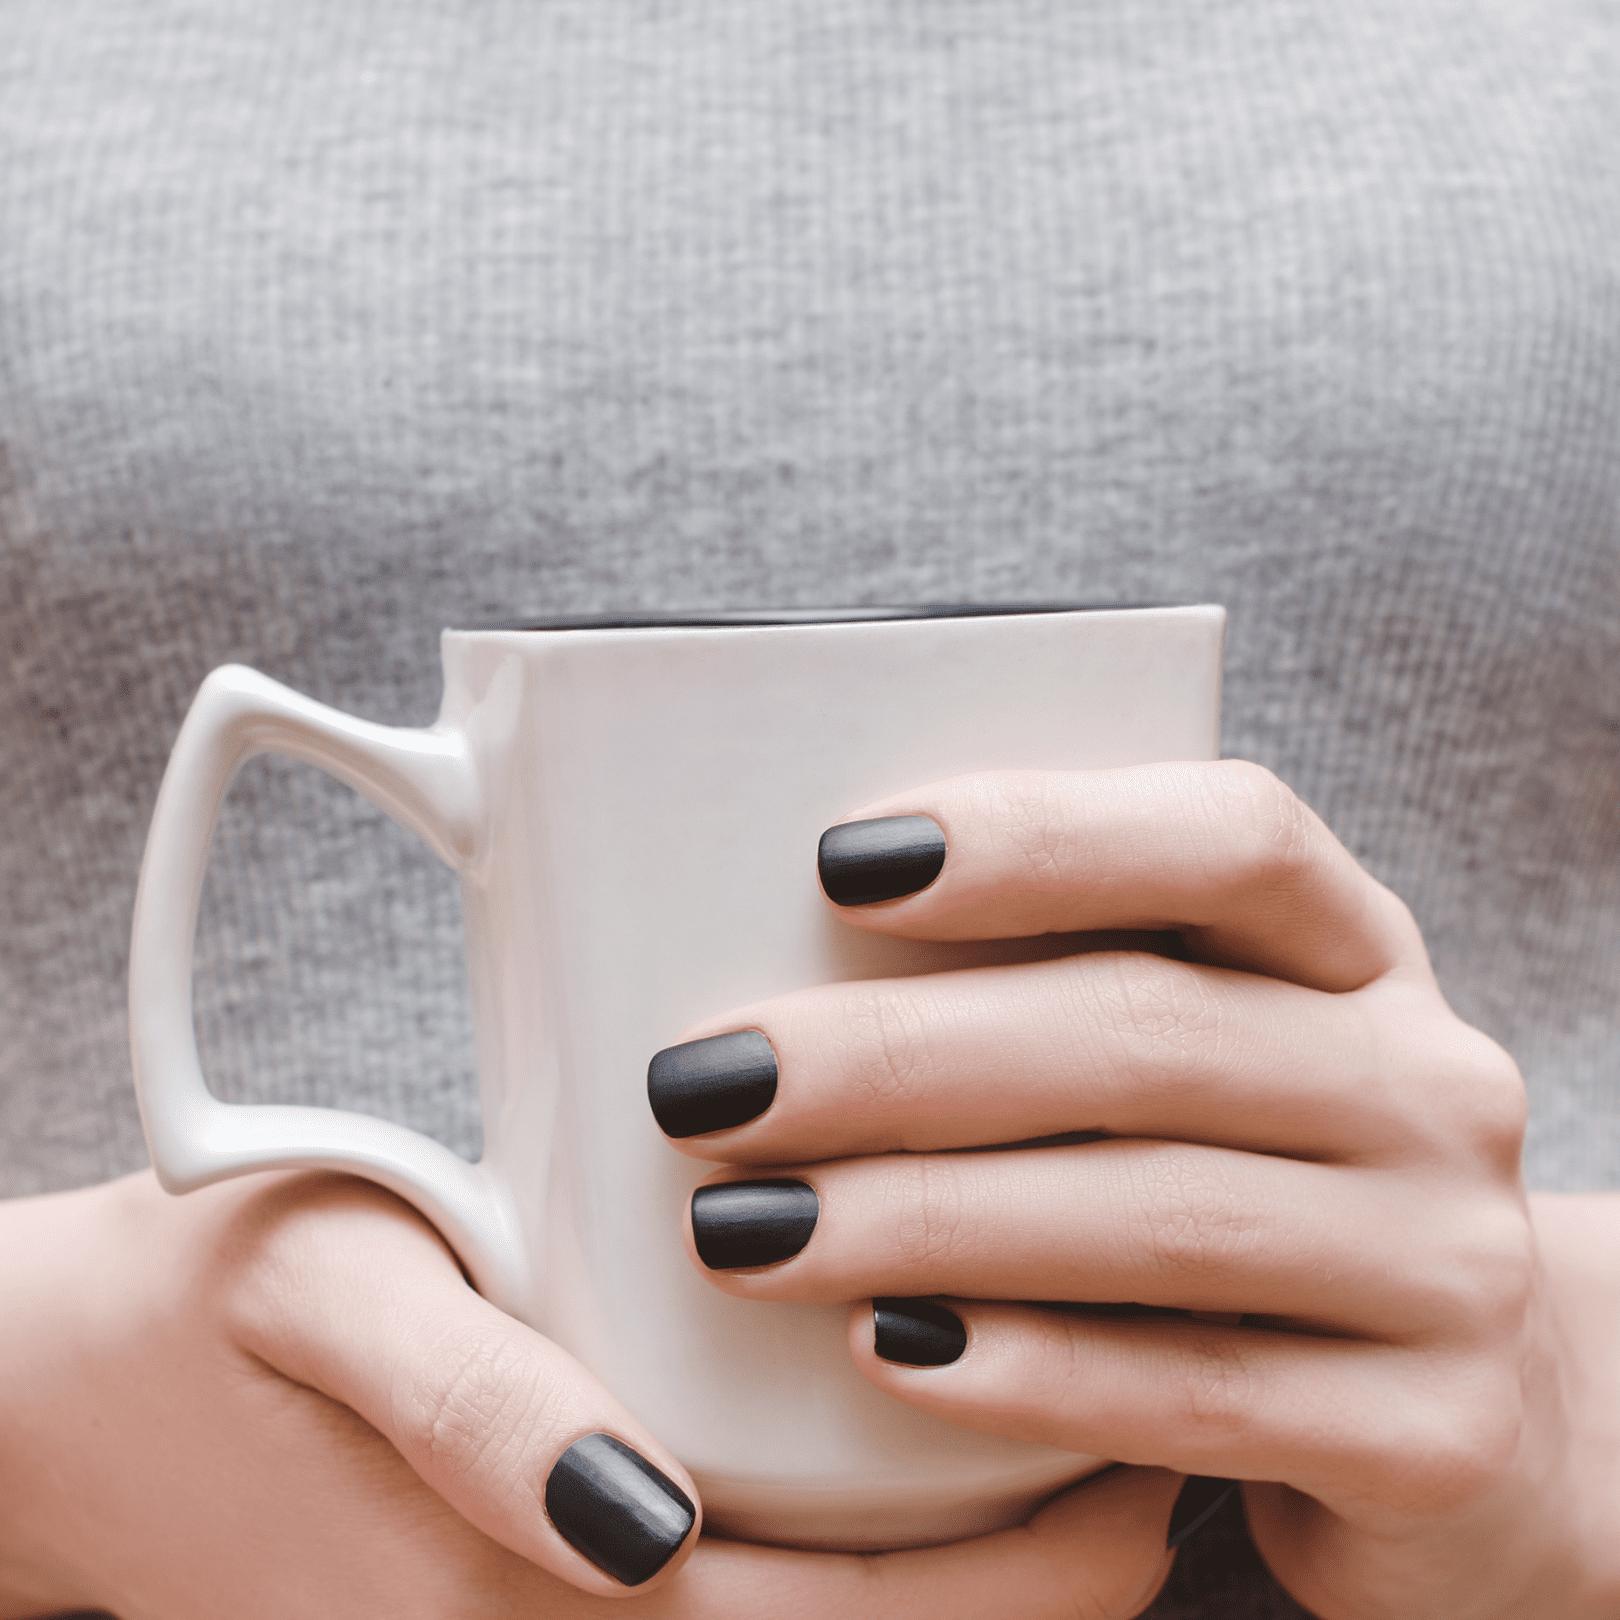 Woman with matte black manicured nails holding coffee mug